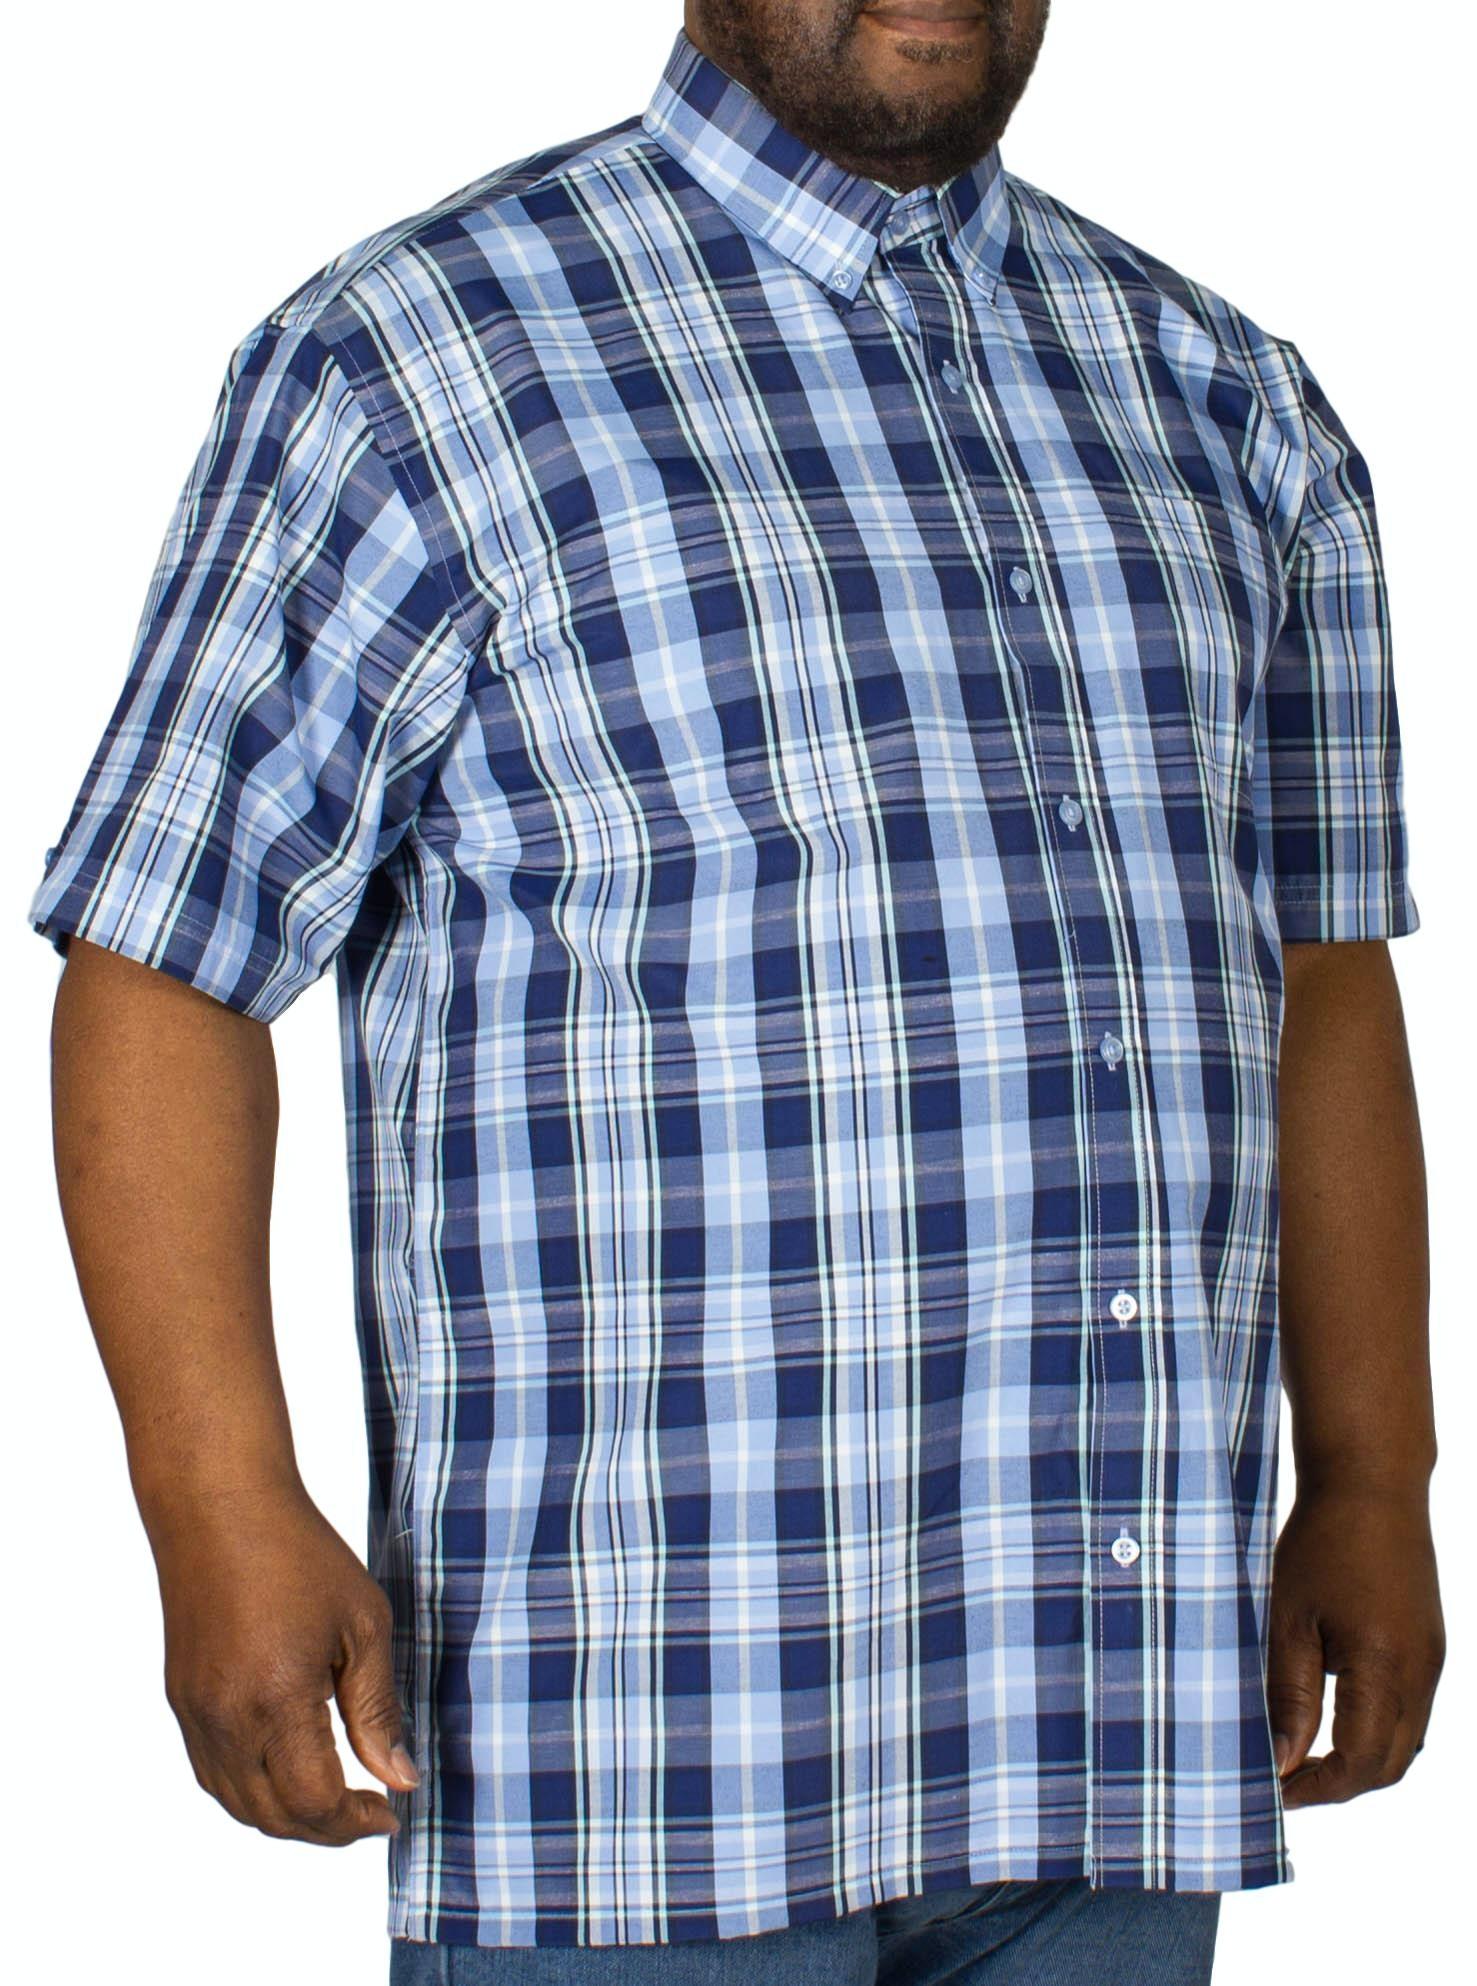 Espionage Check Short Sleeve Shirt Navy/White